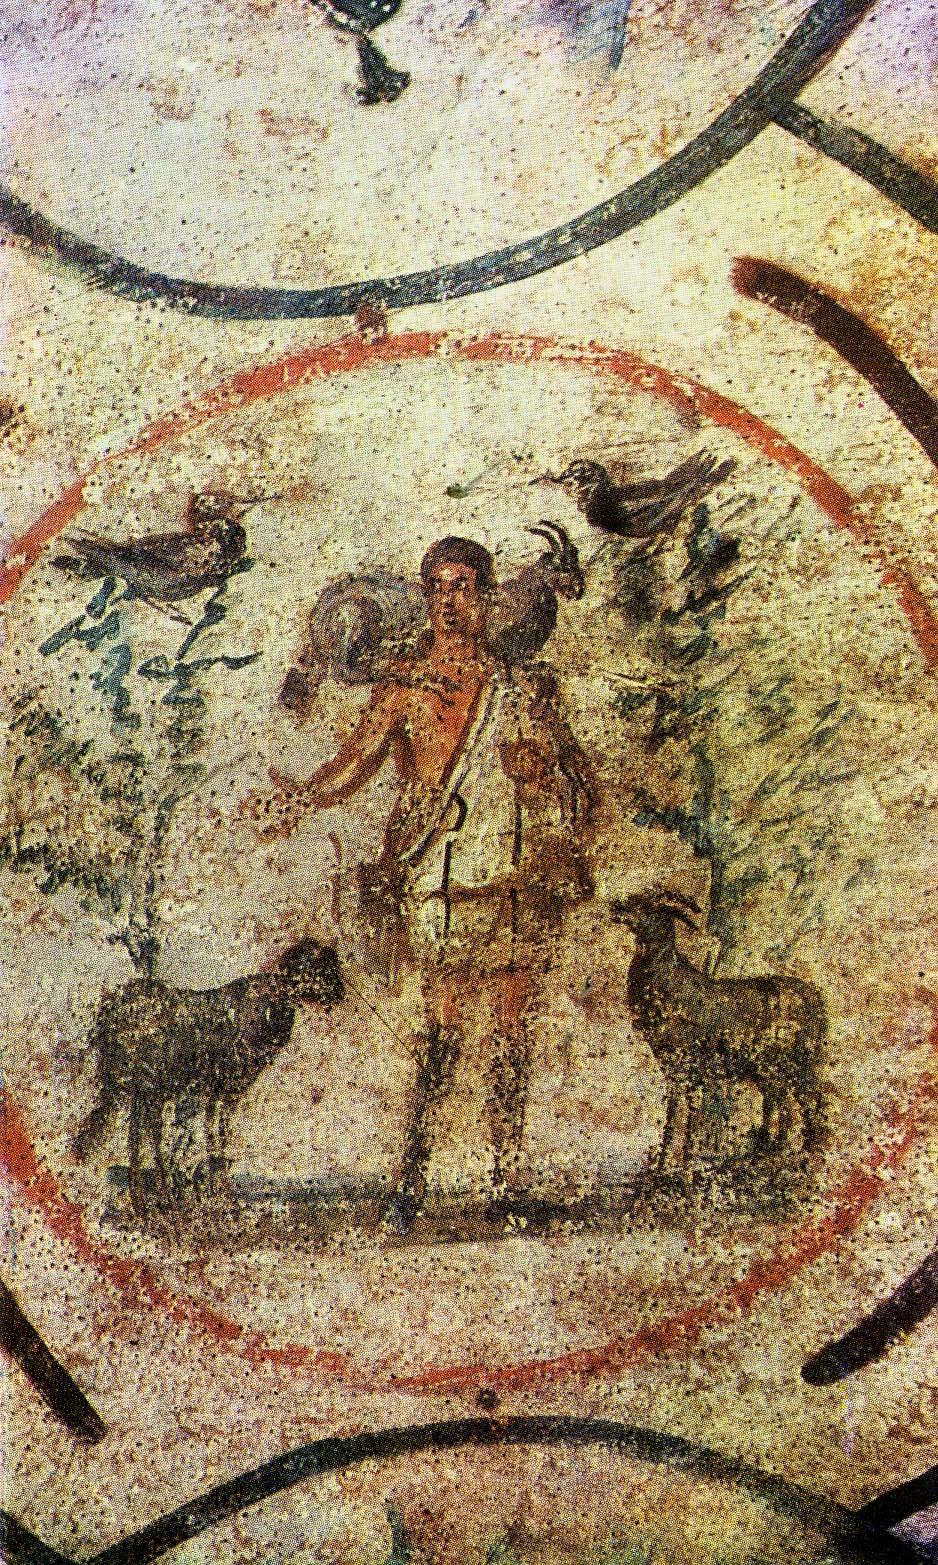 Professor Blanchard's Class Blog: Early Christian Art